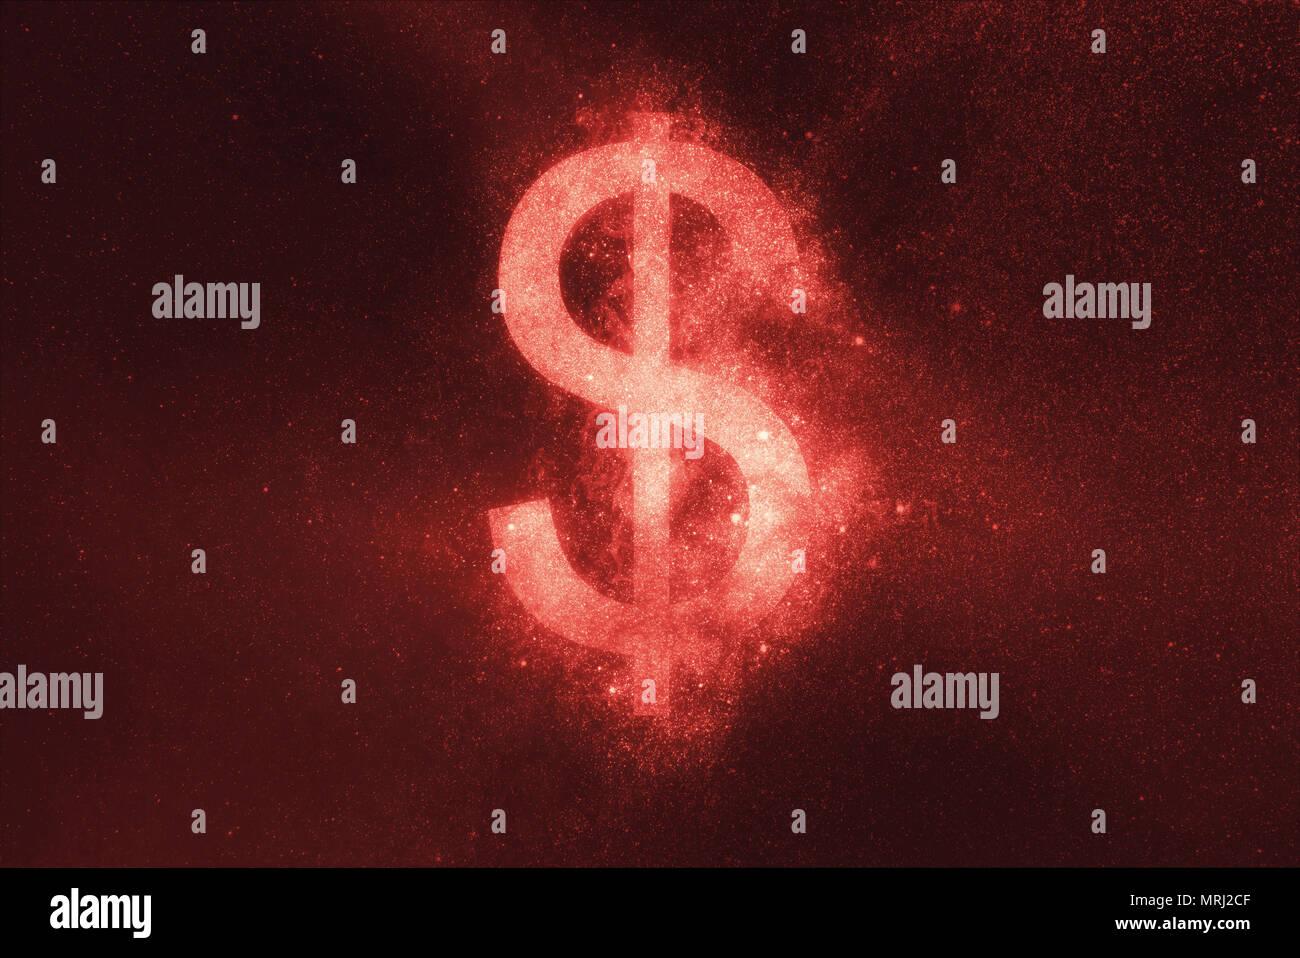 Signo de dólar, símbolo de dólar. Abstract fondo de cielo nocturno Imagen De Stock